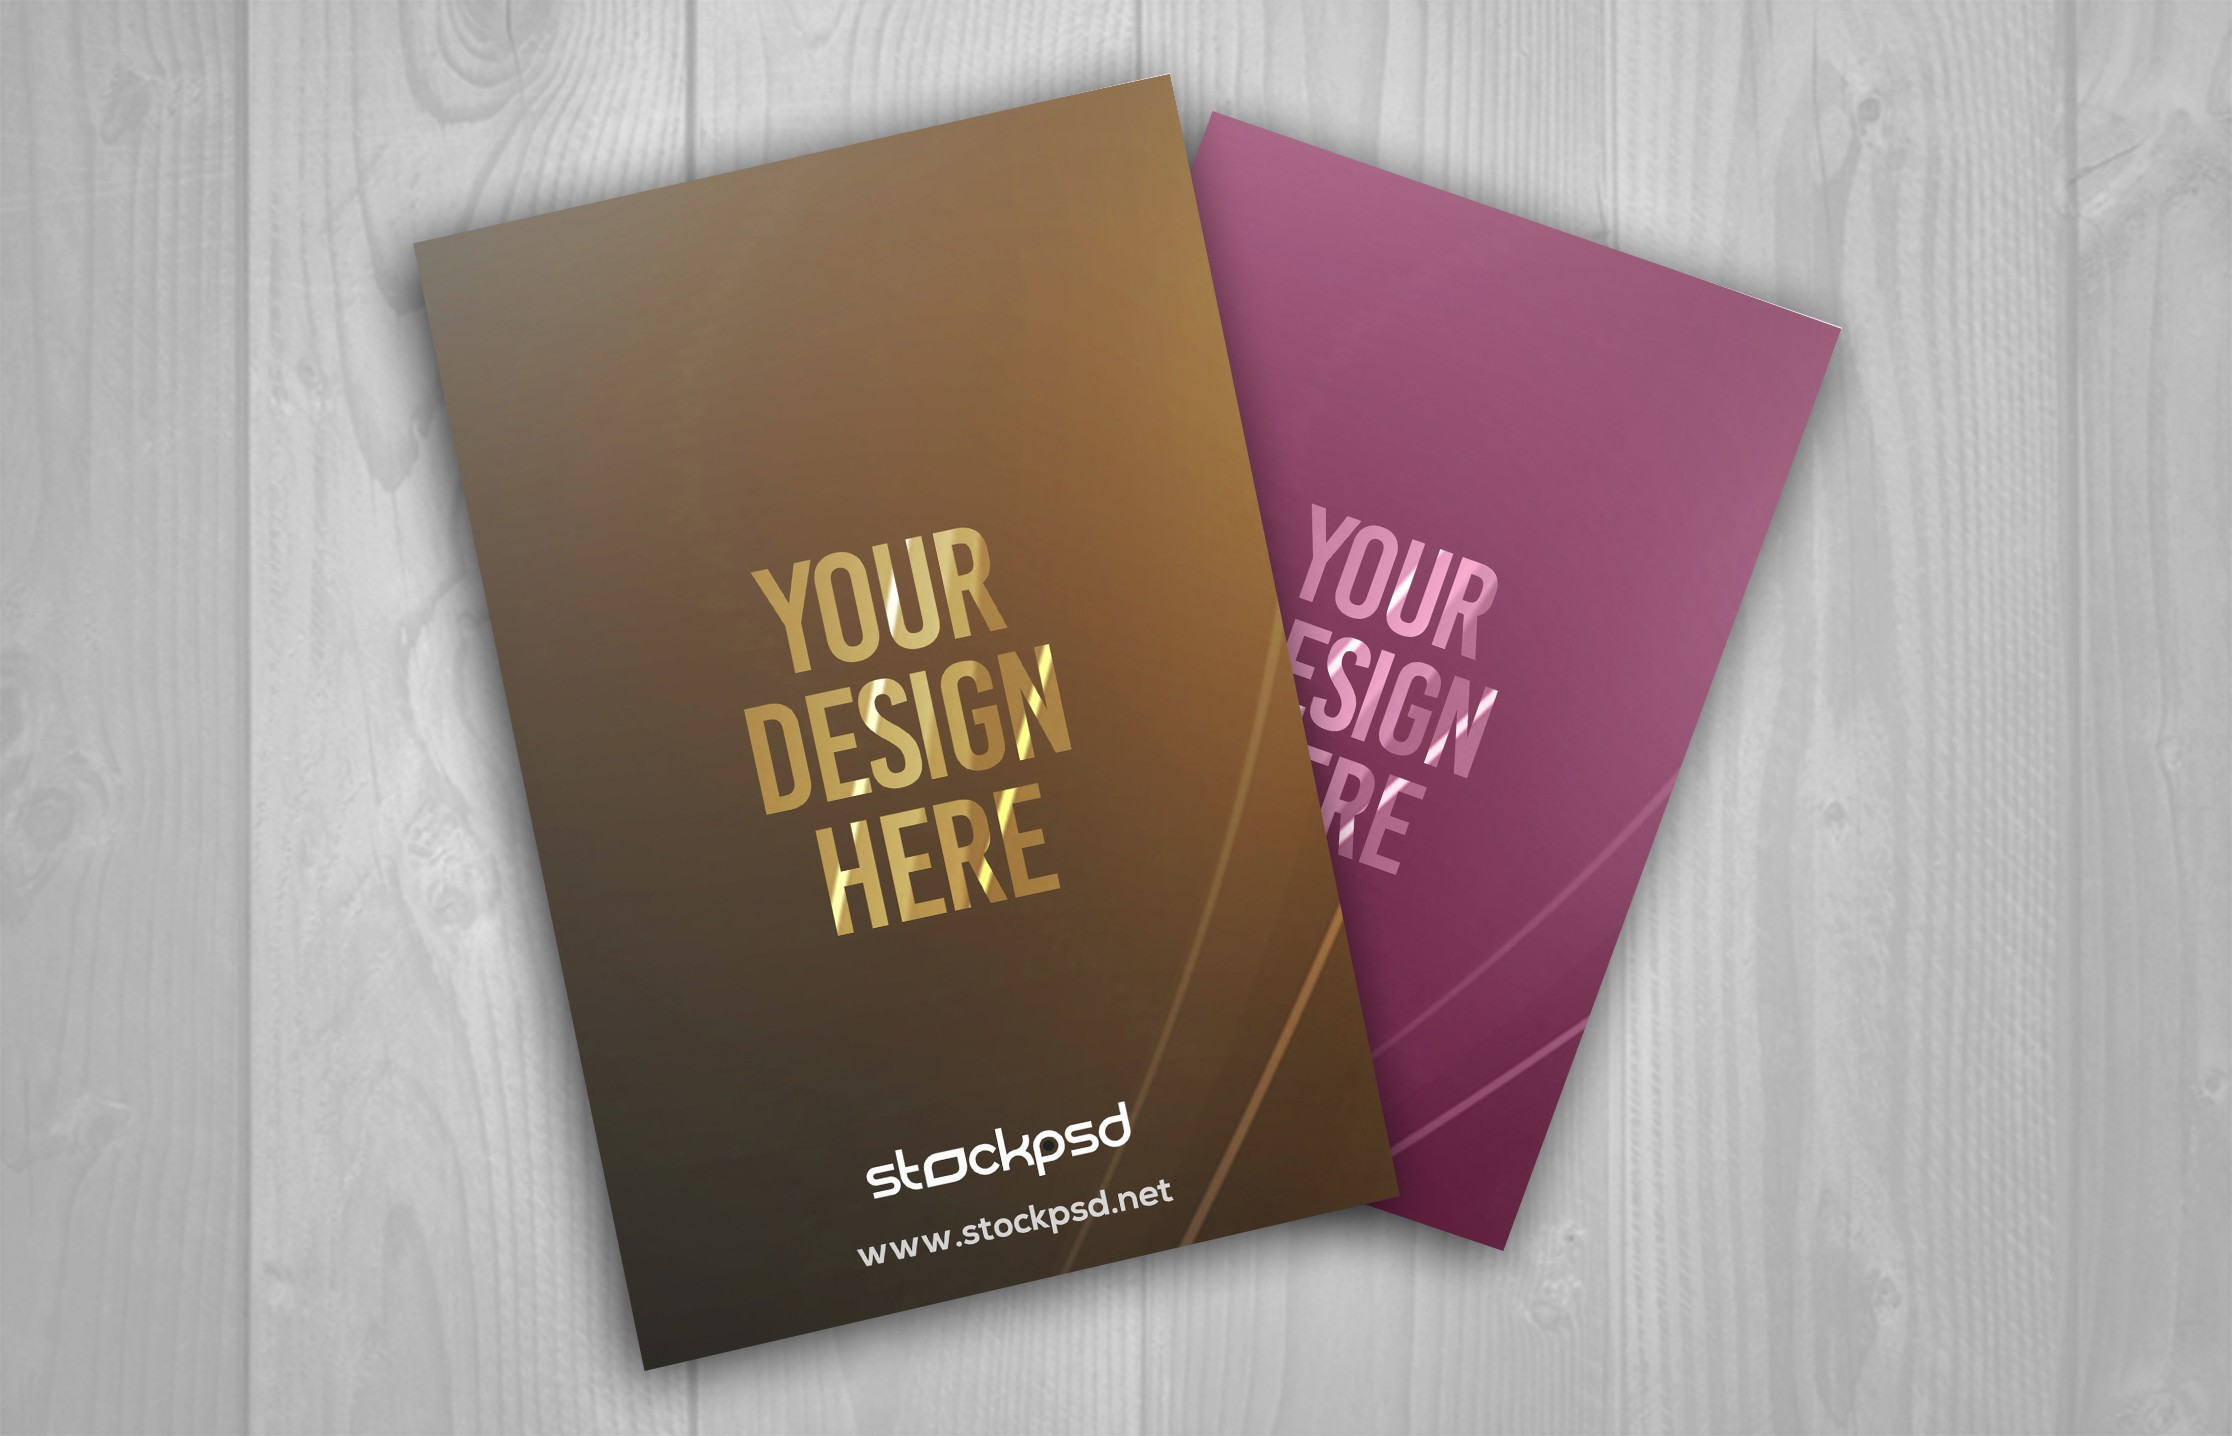 Stockpsd.net – Freebie Templates | Free PSD Flyer Mockup PSD - 4x6 ...